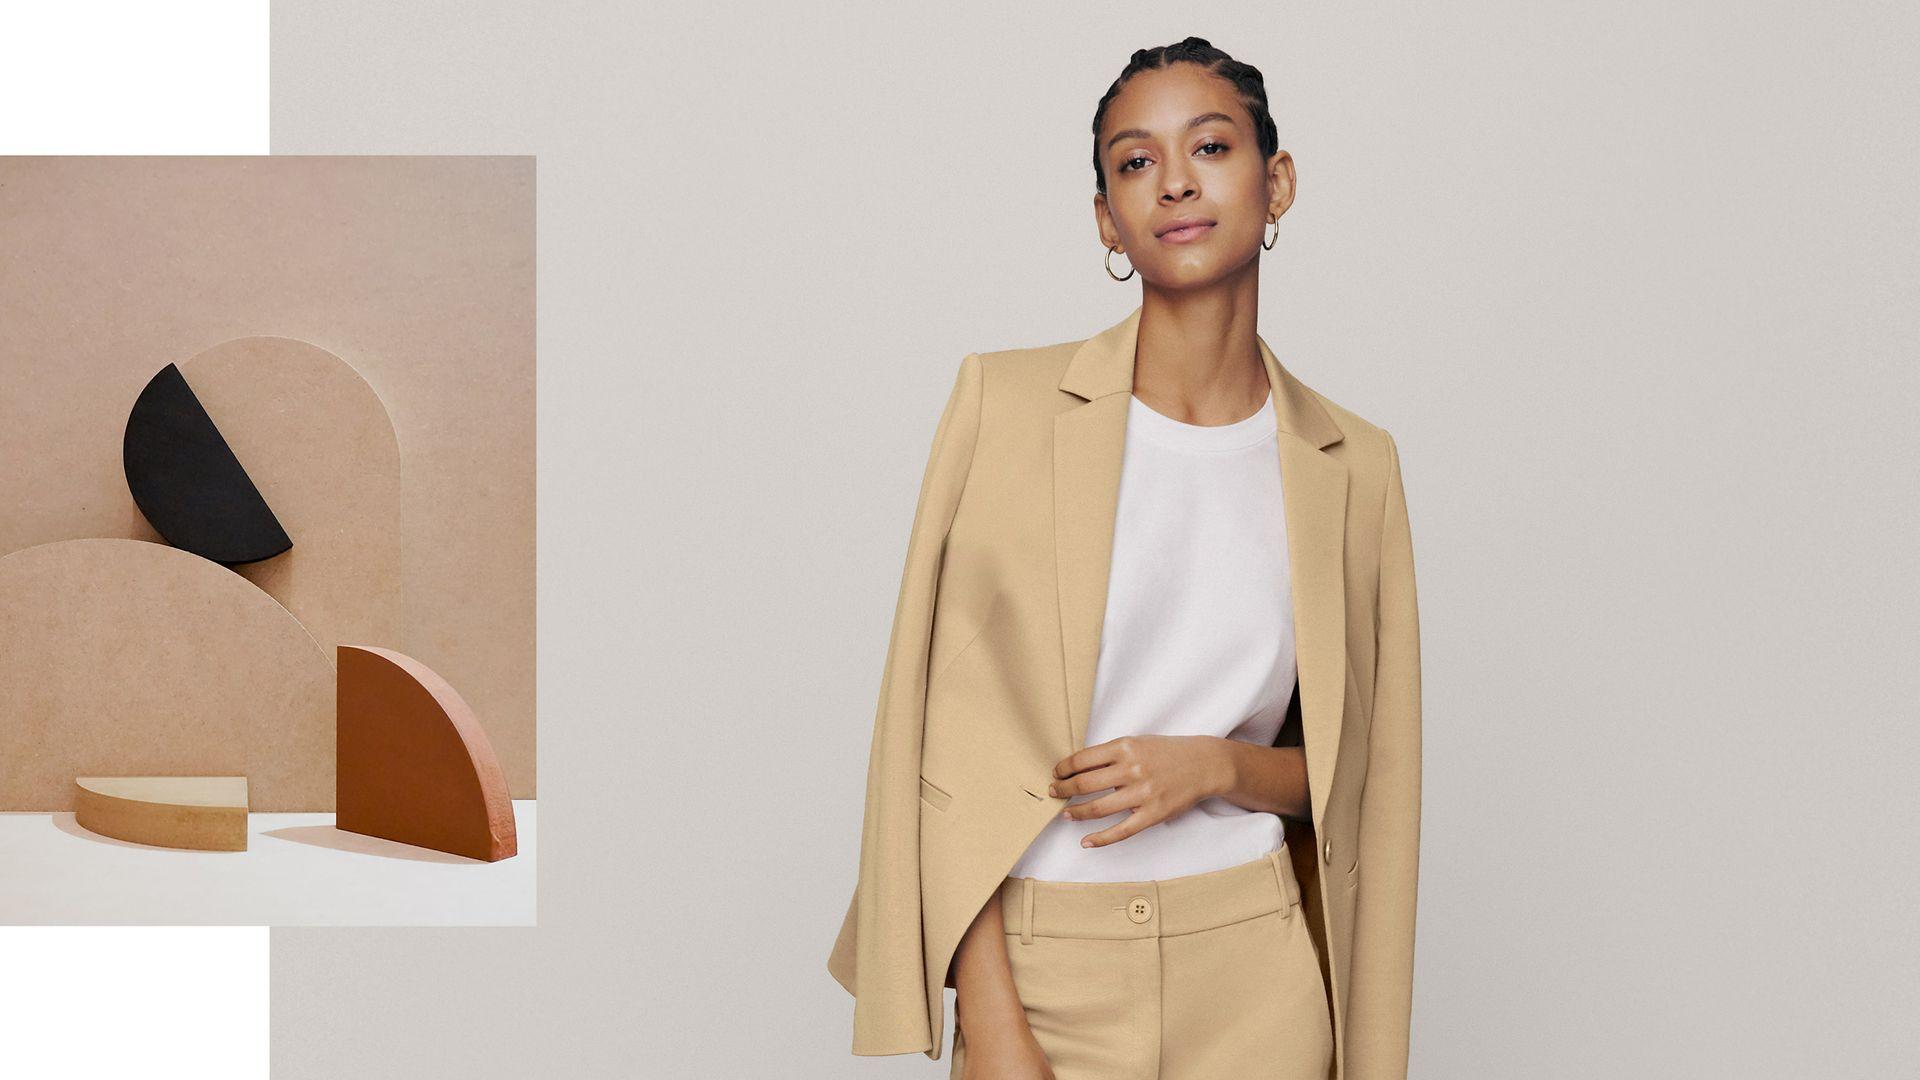 072021 - Women - Inspiration - Lookbook - Simply perfect trousers - Hero Large 4 - IMG - V2.jpg